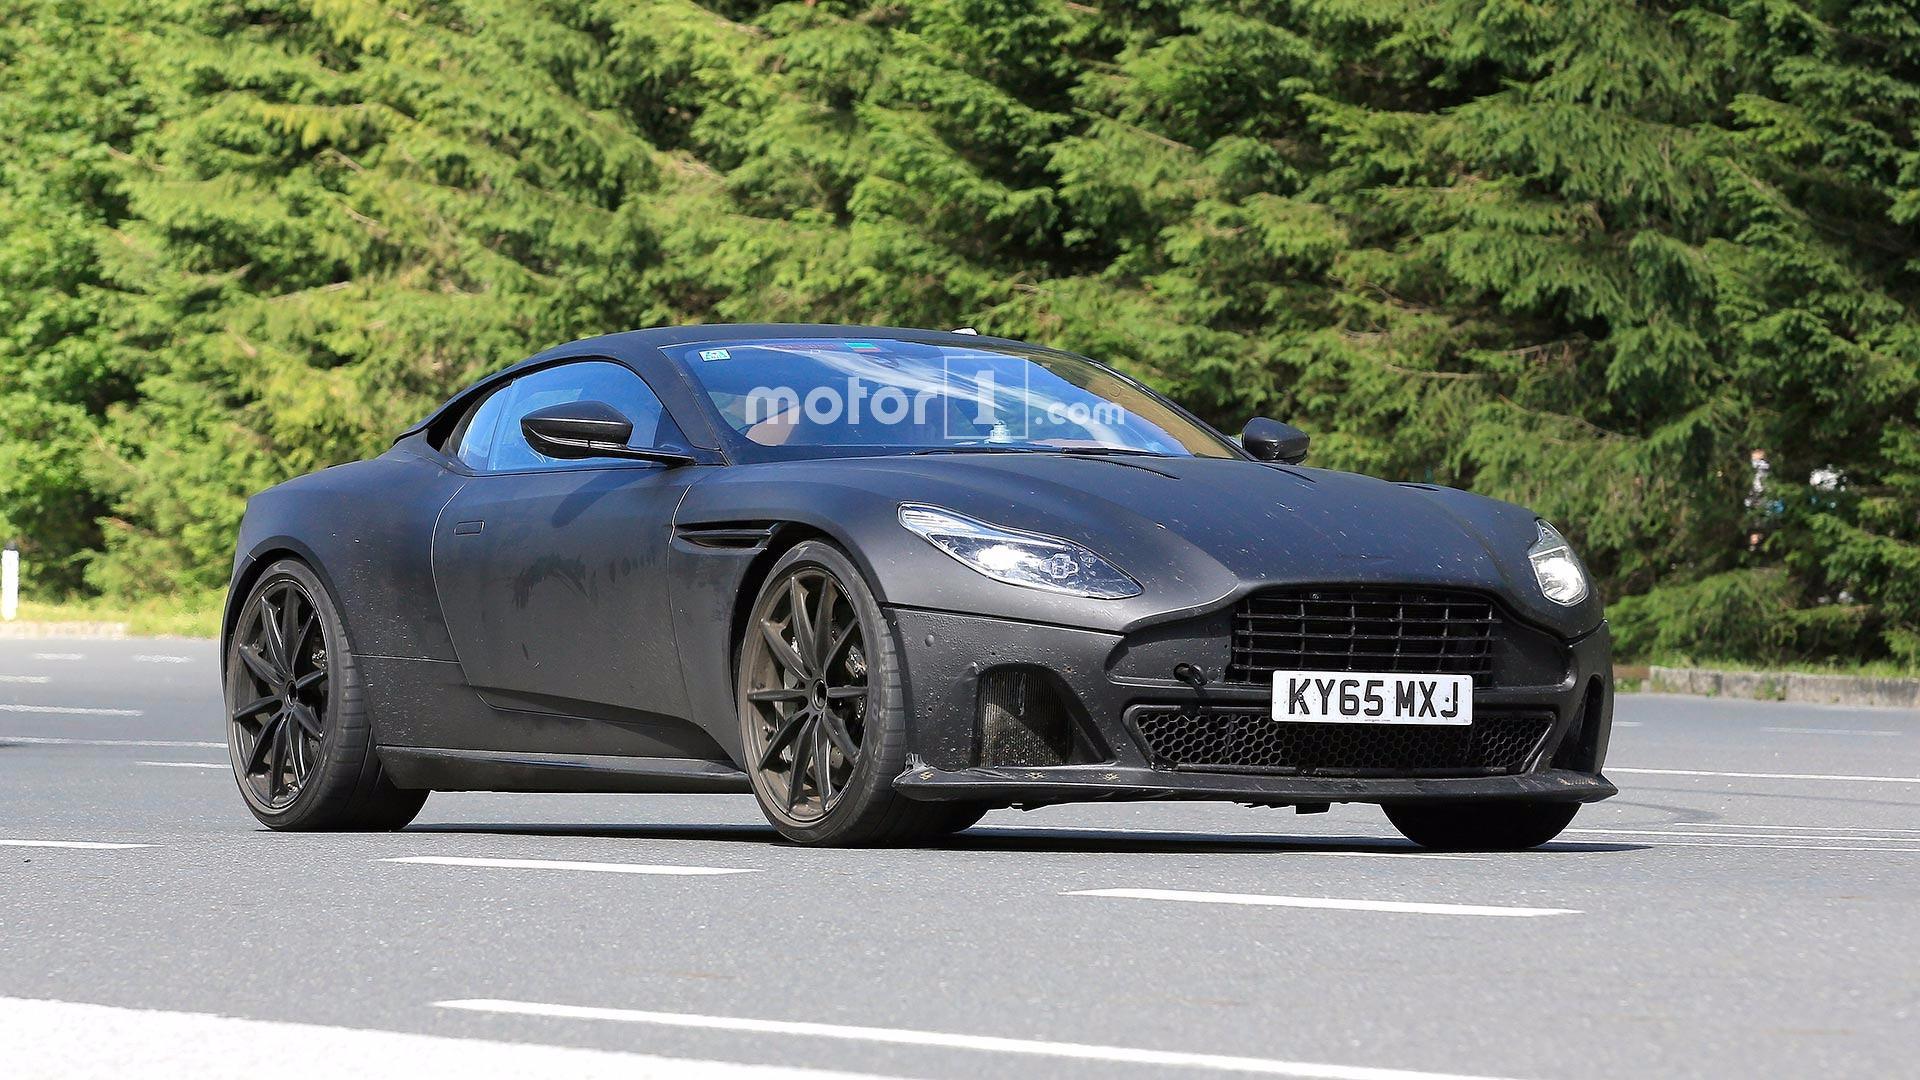 Aston Martin Db11 S Spied With Matte Black Body Lower Suspension